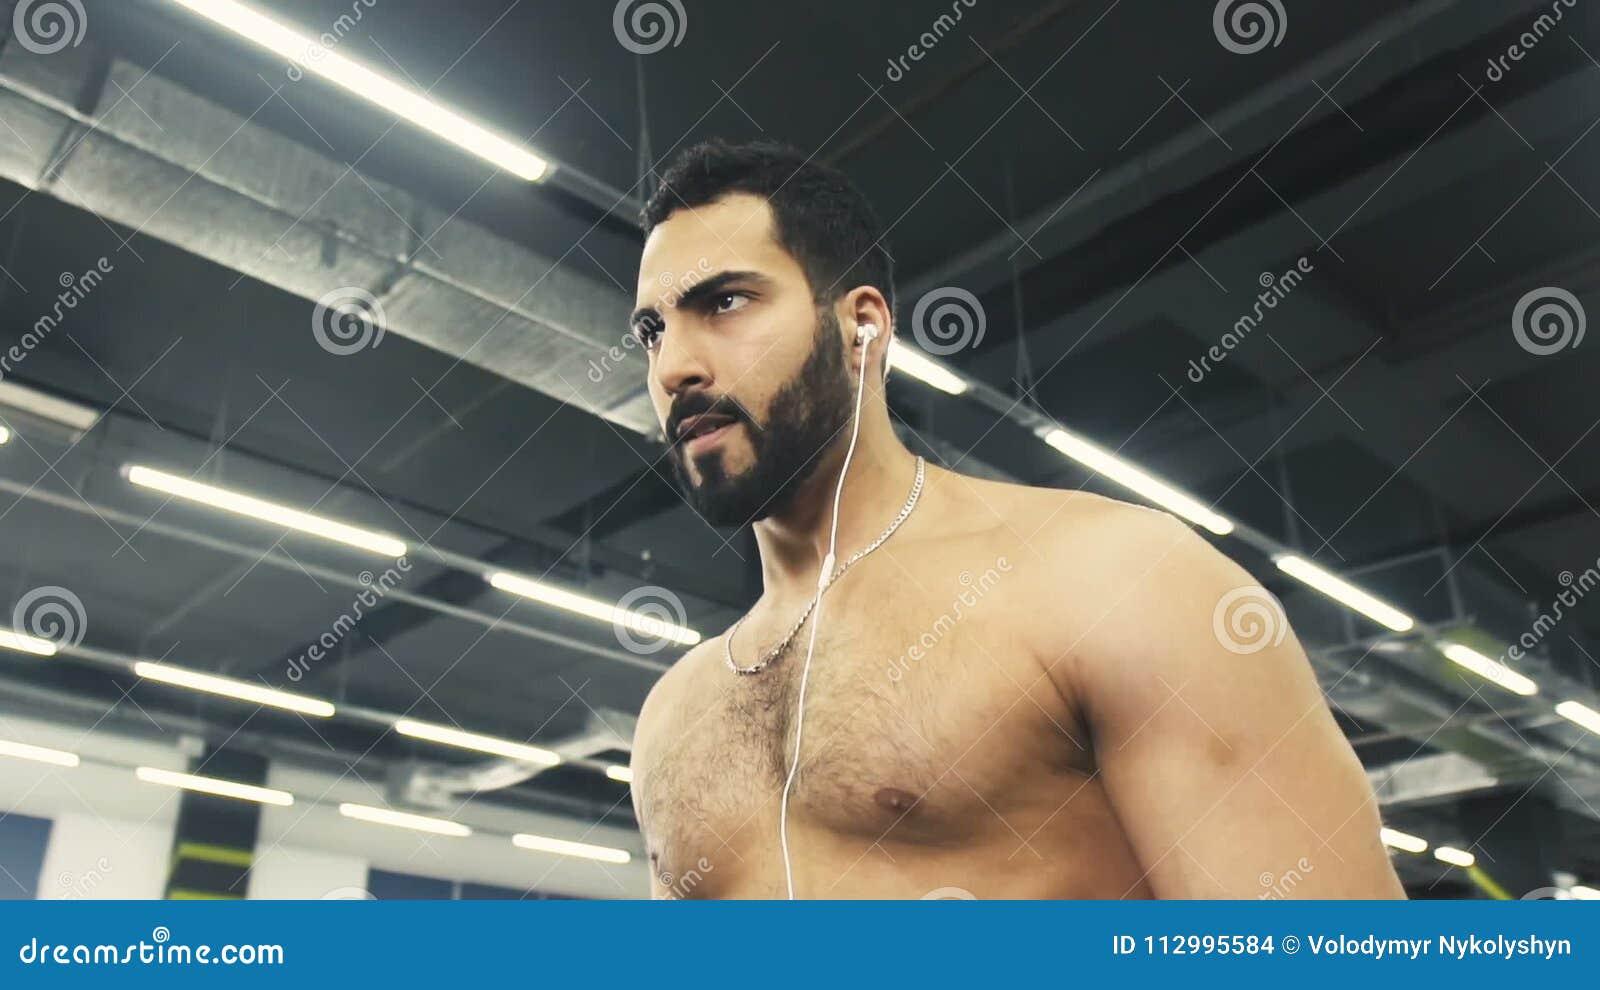 Man Does Biceps Workout